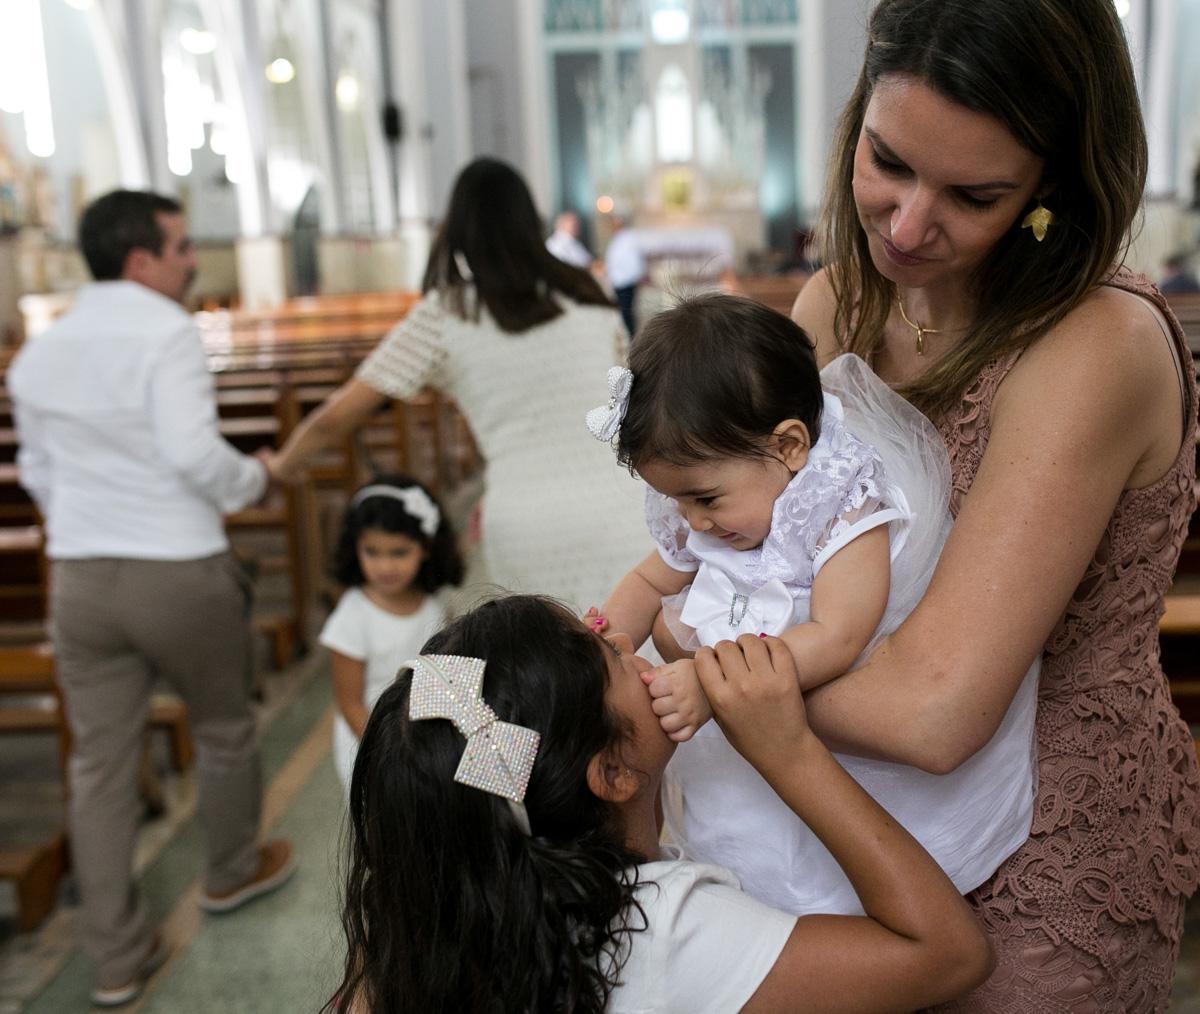 batizado, belo horizonte, batismo, batismo sofia, gustavo dragunskis